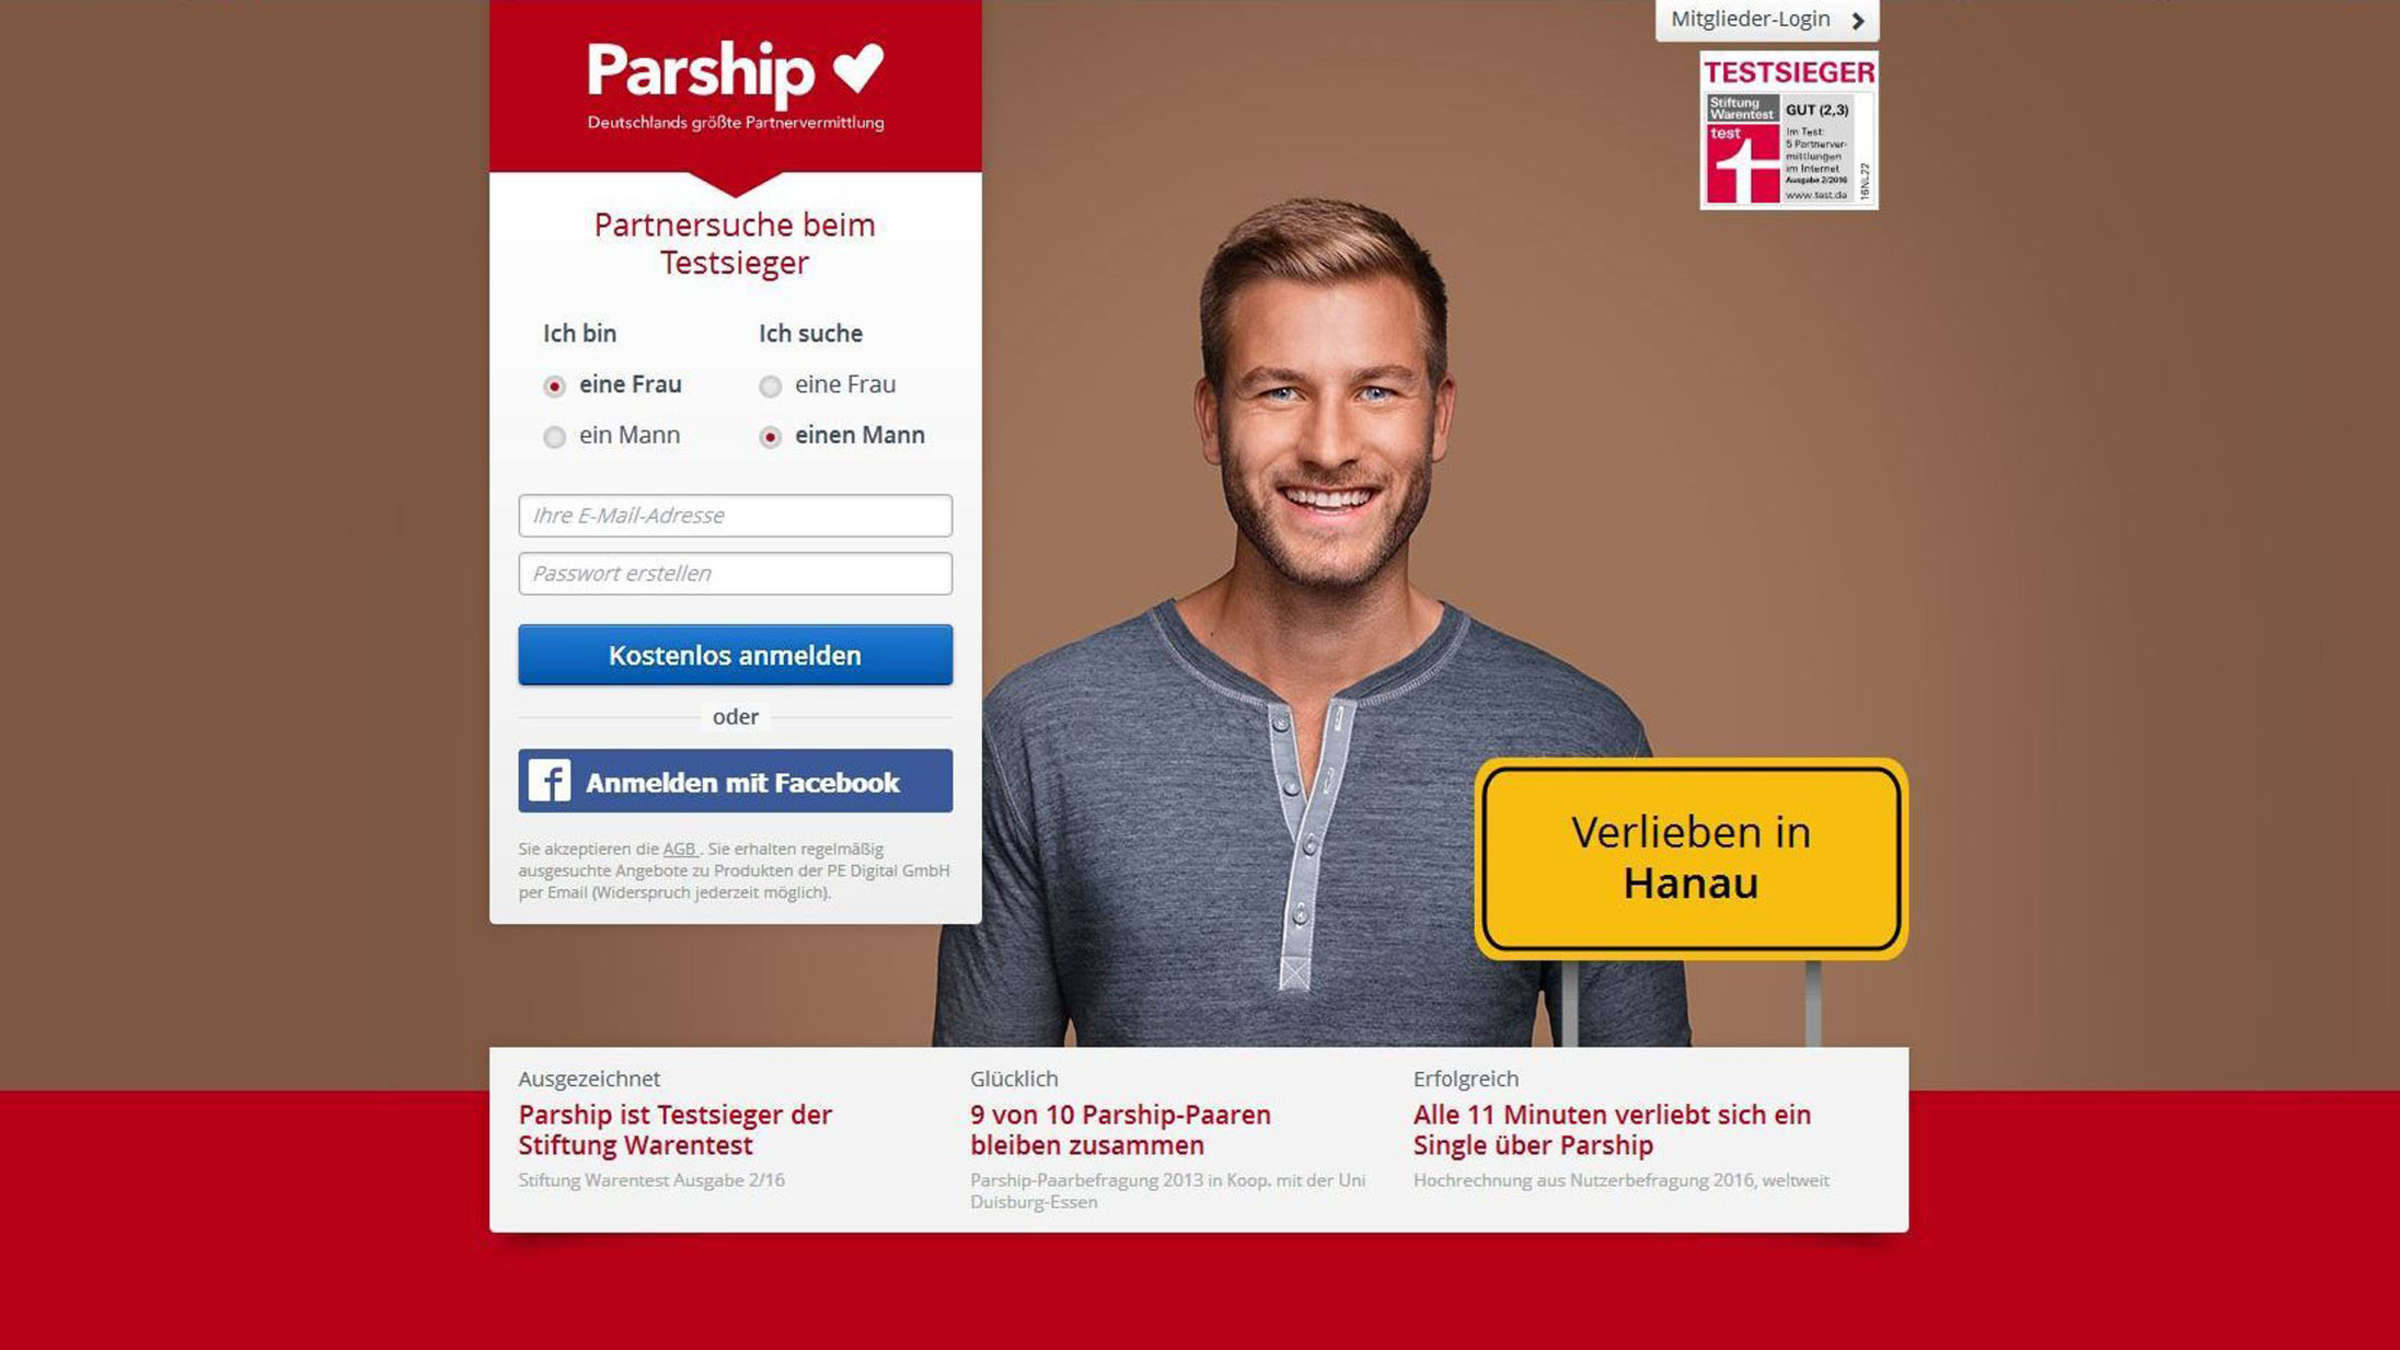 Werbung model parship 2017 Werbung 2017: